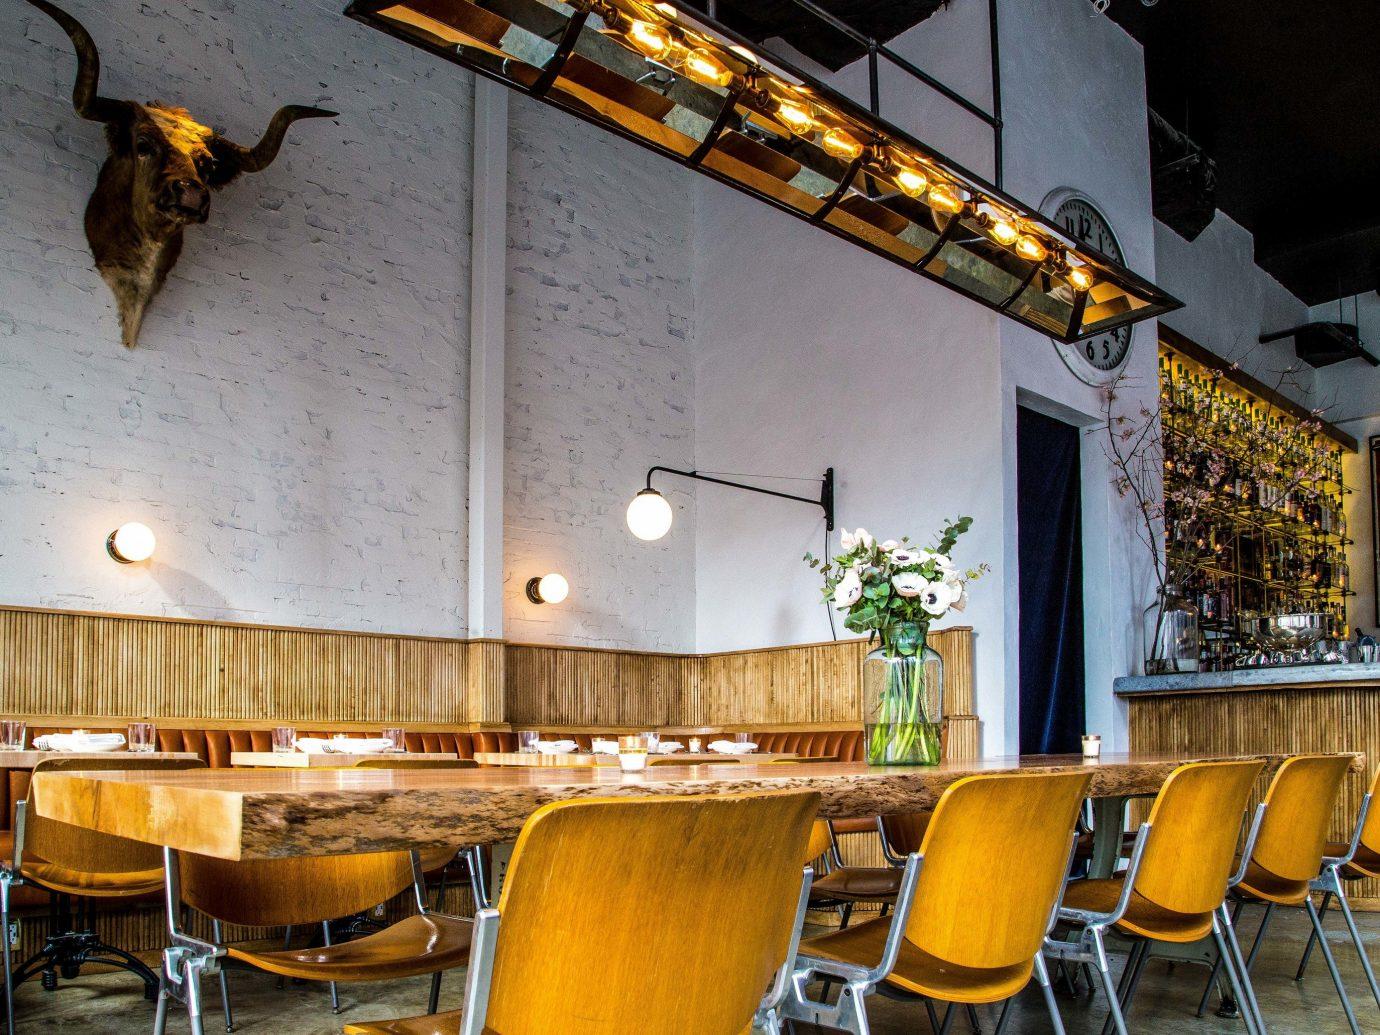 Trip Ideas Weekend Getaways table indoor chair restaurant Bar Dining yellow interior design meal area